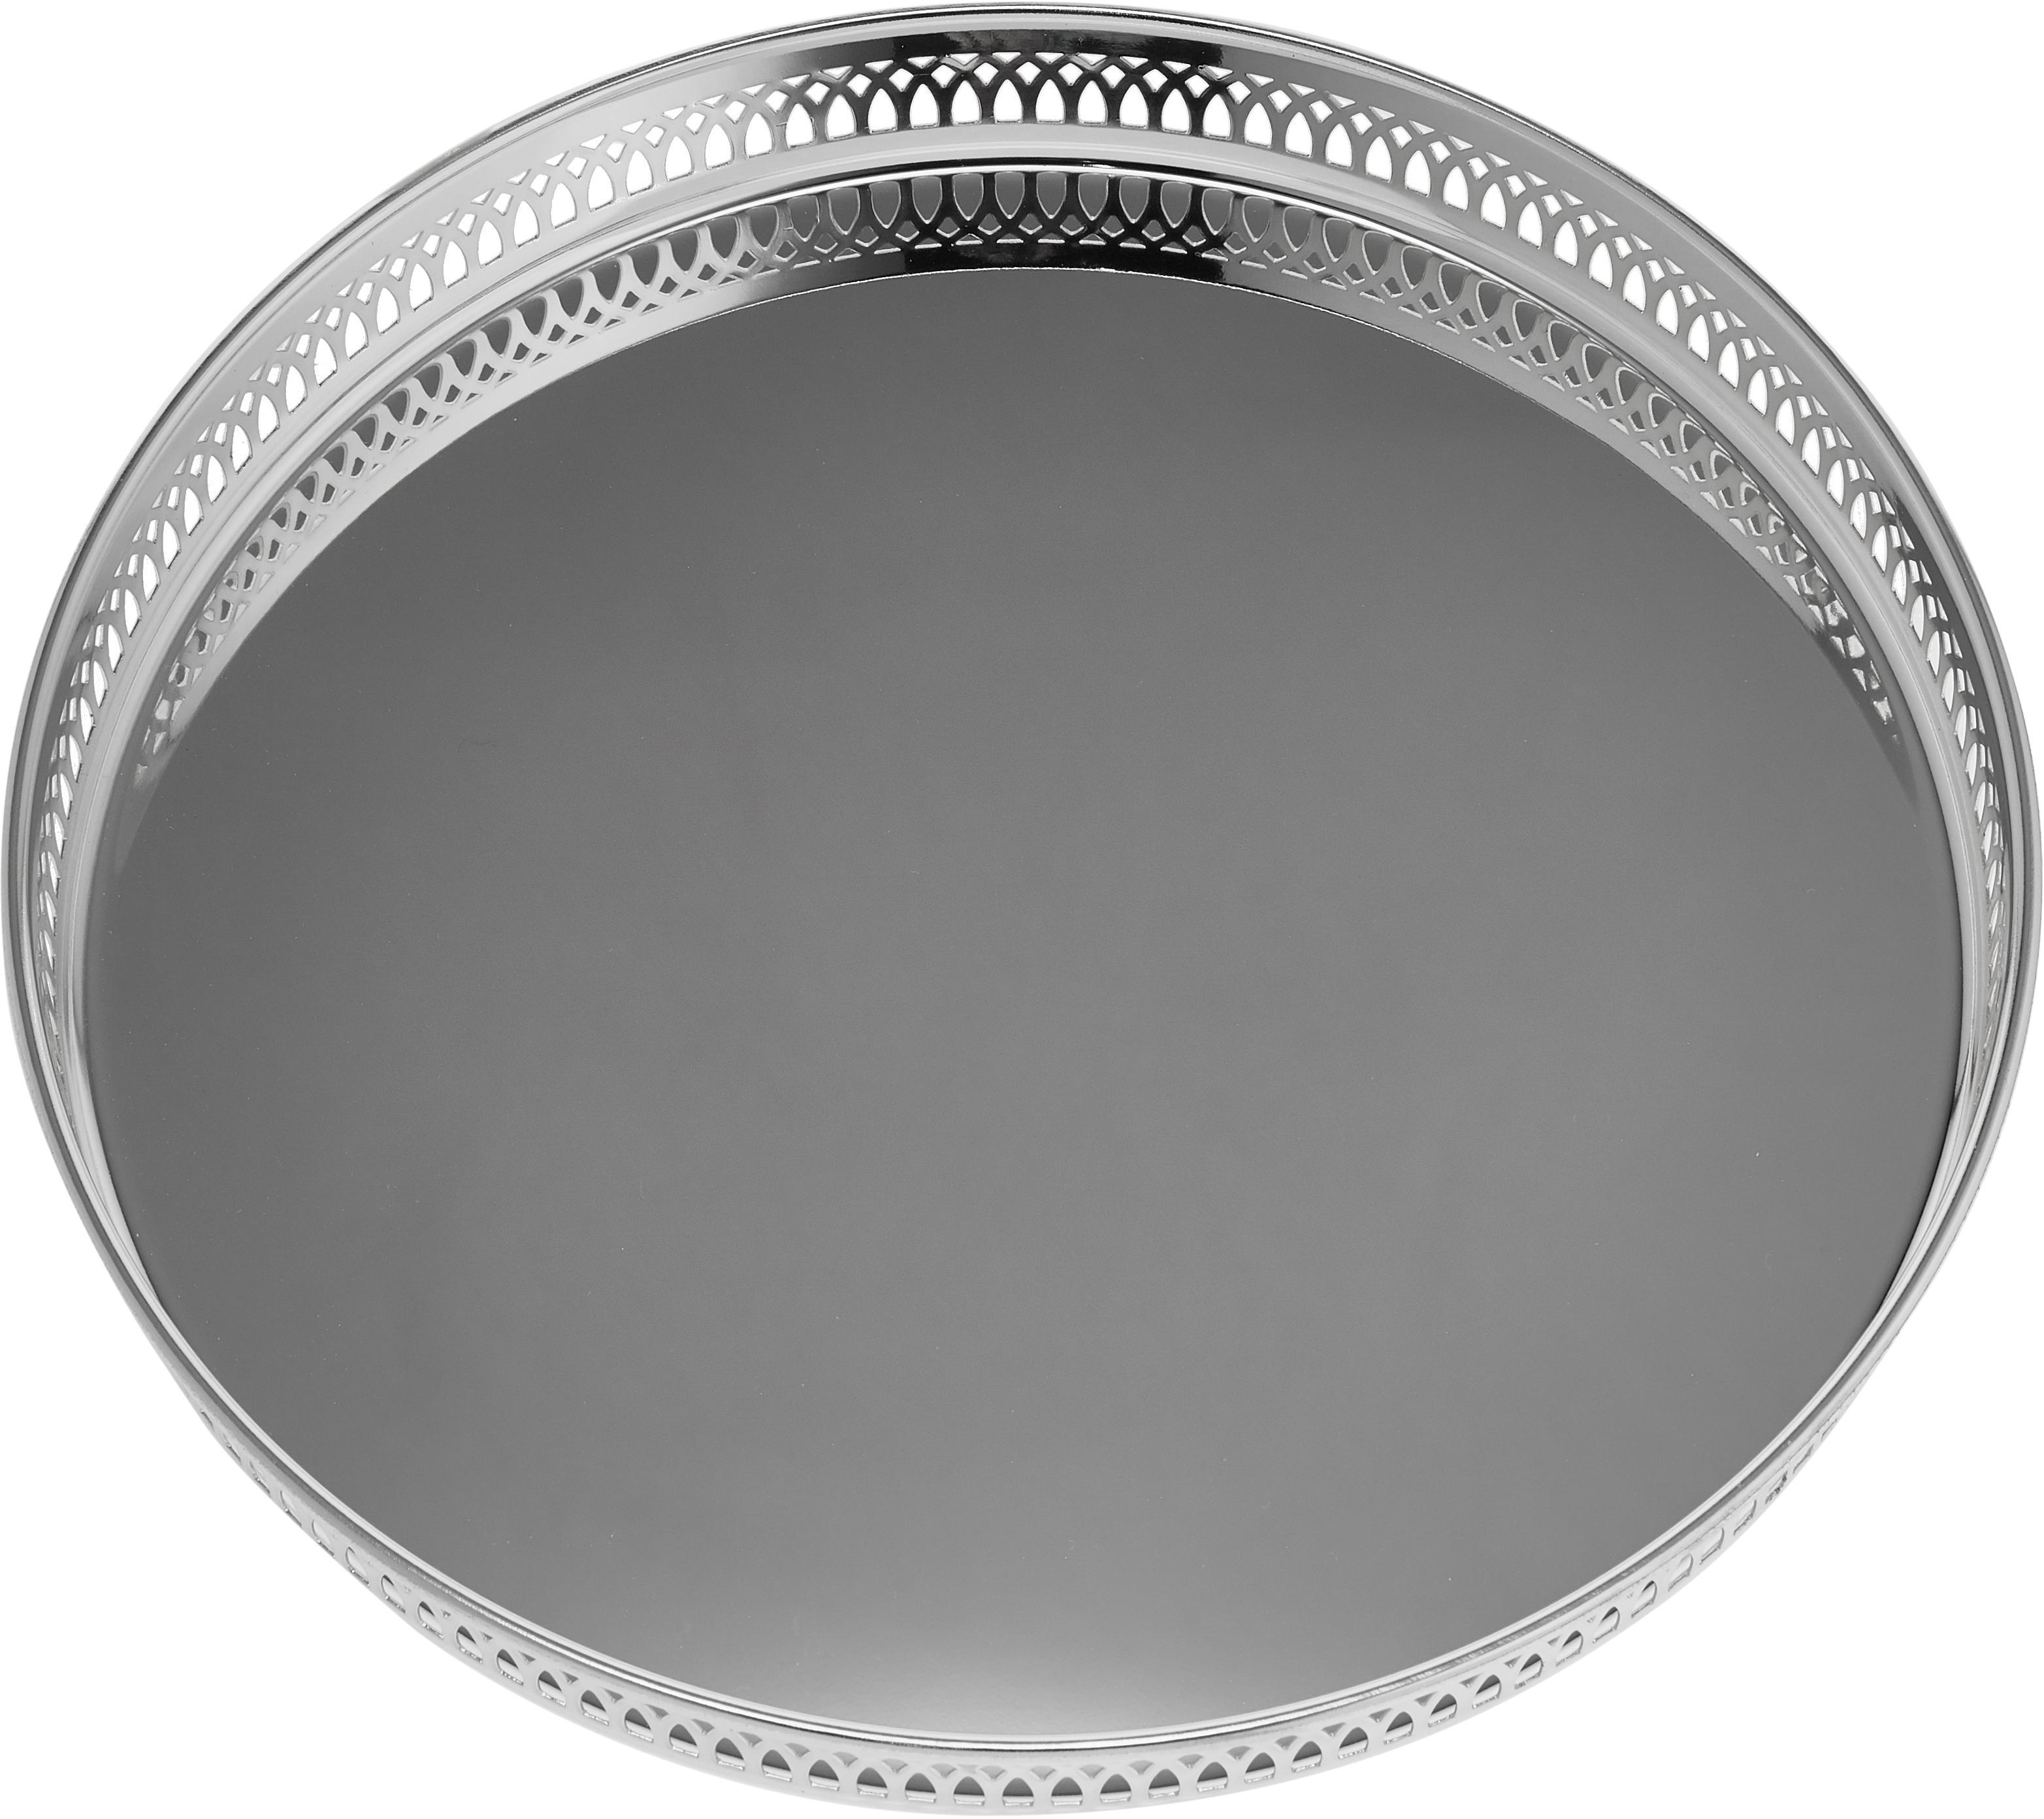 Rundes Spiegeltablett Delphi, versilbert, Stahl, versilbert, Silber, Ø 30 cm